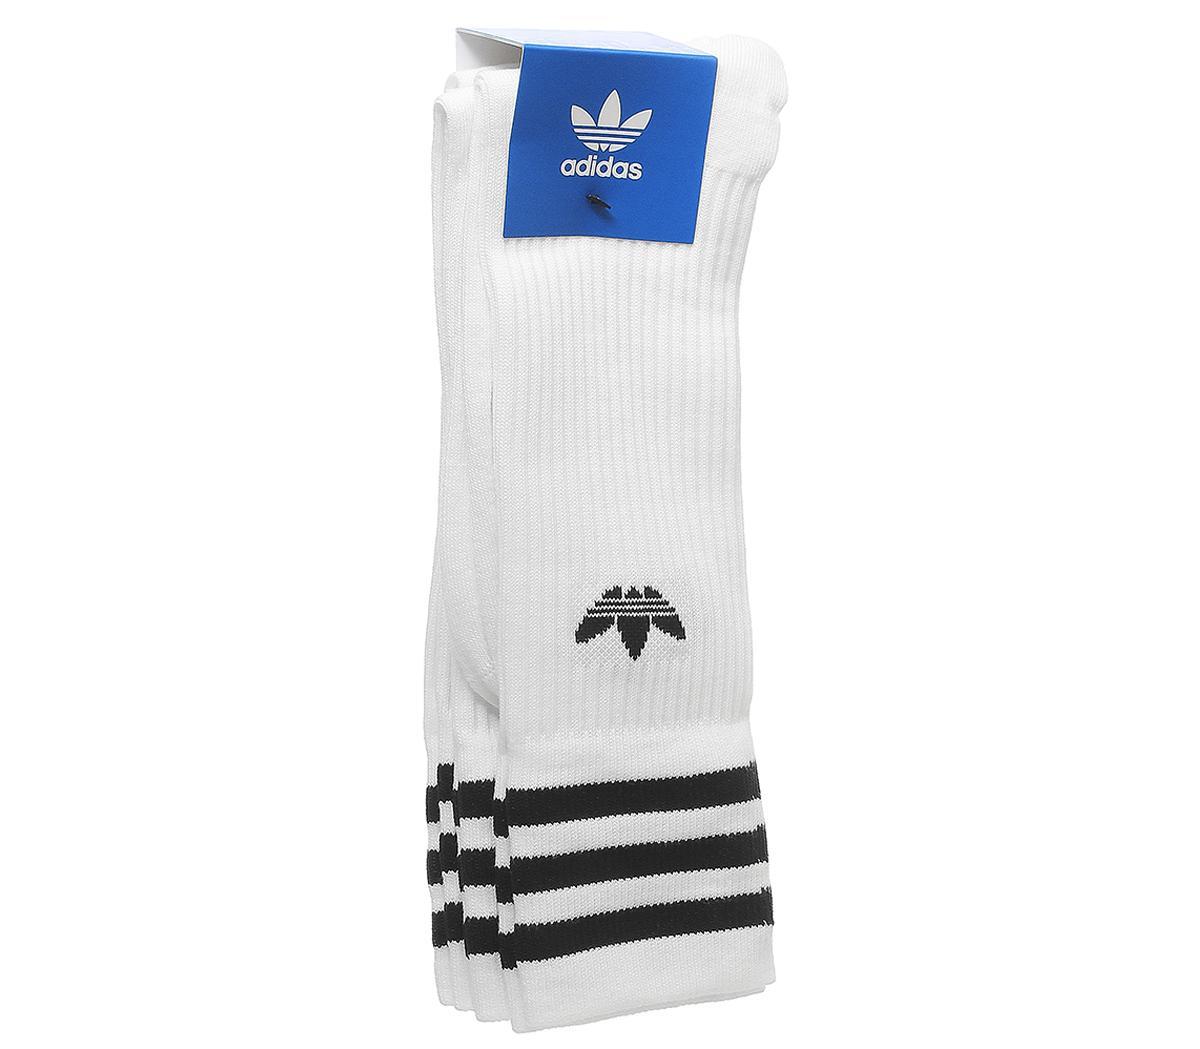 Solid Crew Socks 3 Pack